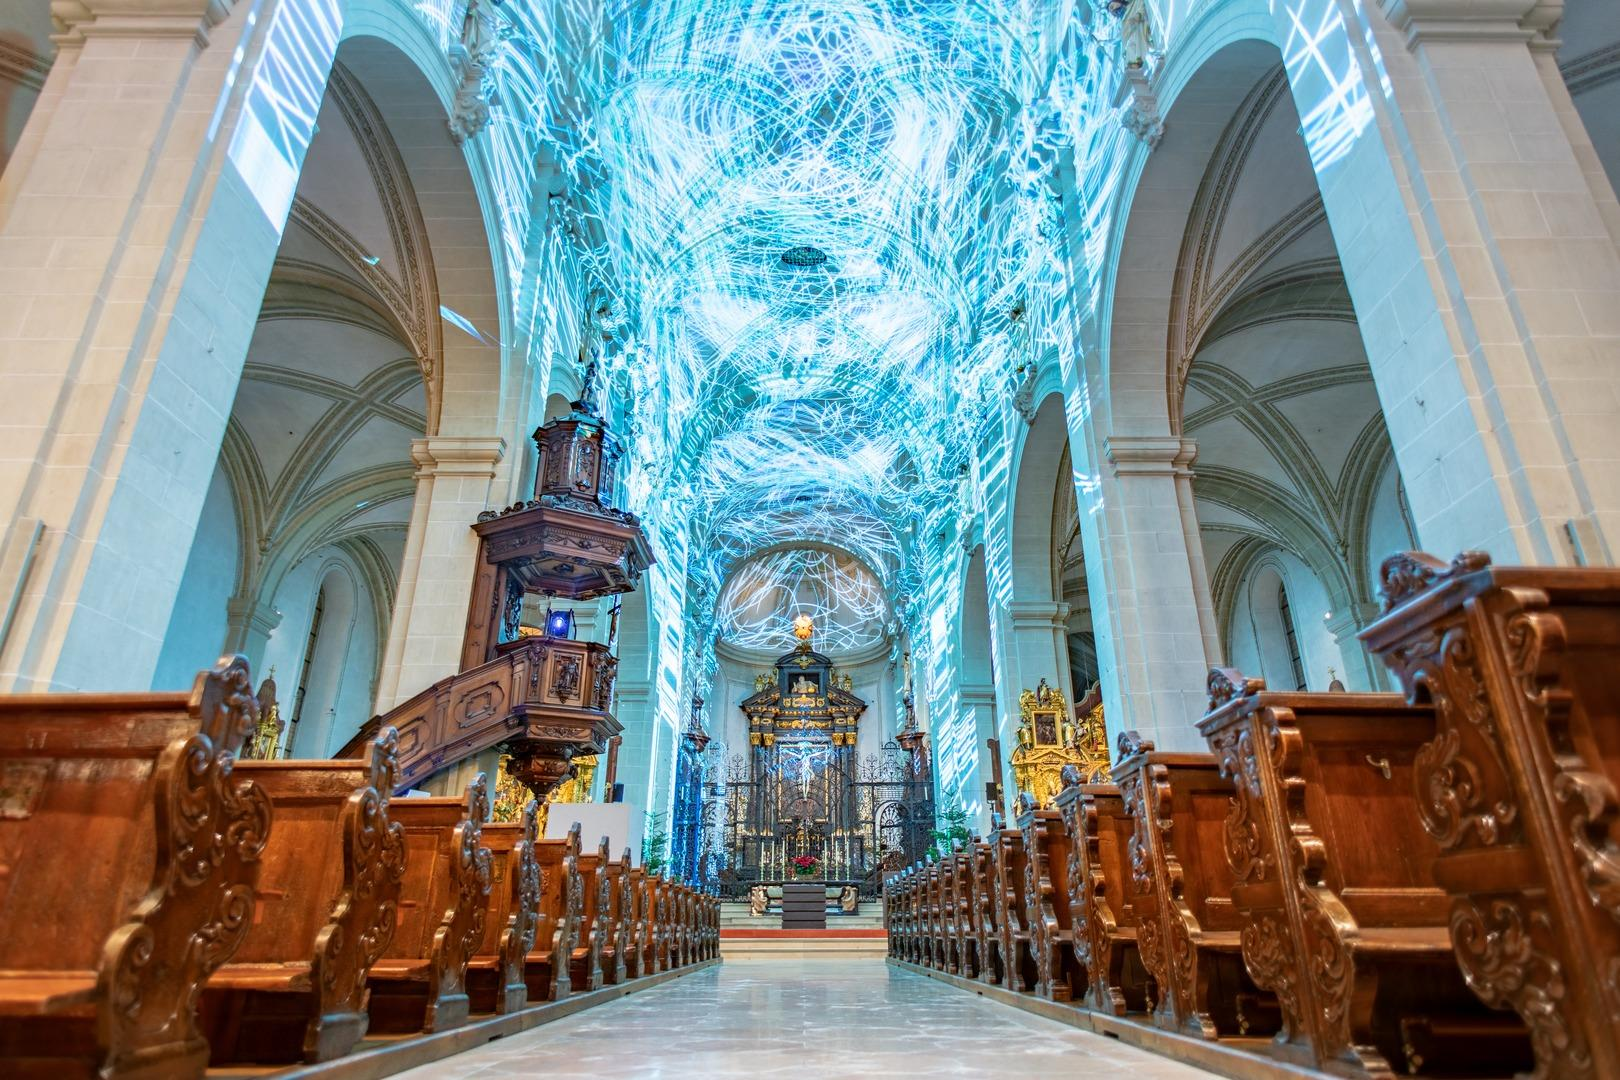 Genesis Light Show in the Hofkirche, the Church of St. Leodegar - LTAG/Elmar Bossard